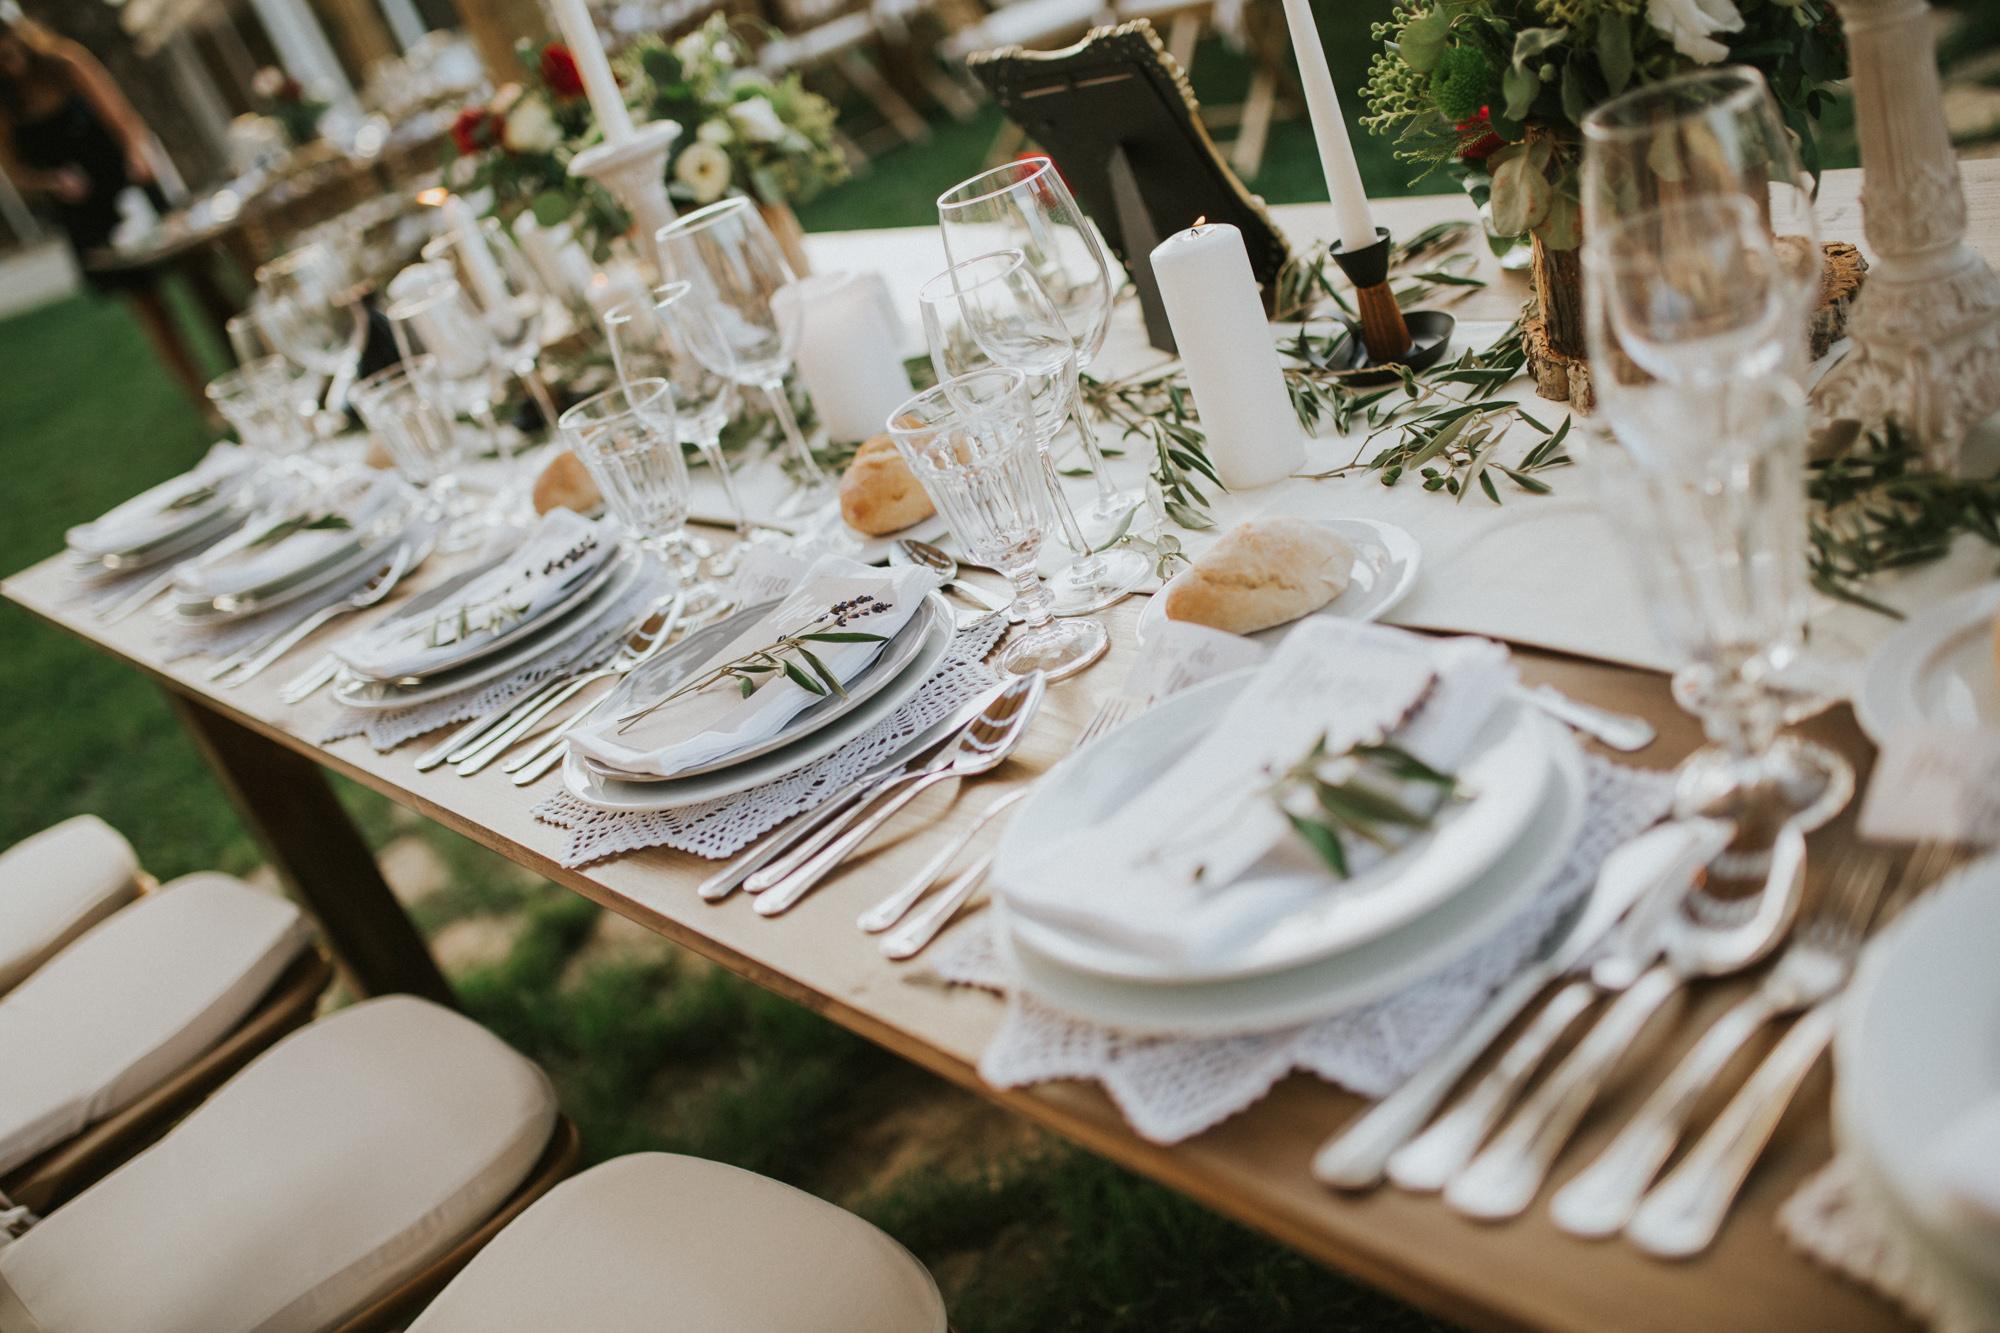 065-carina-e-samuel-wedding-casamento-quinta-dos-rouxinois-rustico-my-fancy-wedding-mafra-malveira-lisboa-sintra-cascais-filipe-santiago-fotografia-fotografo-lifestyle-destination-portugal